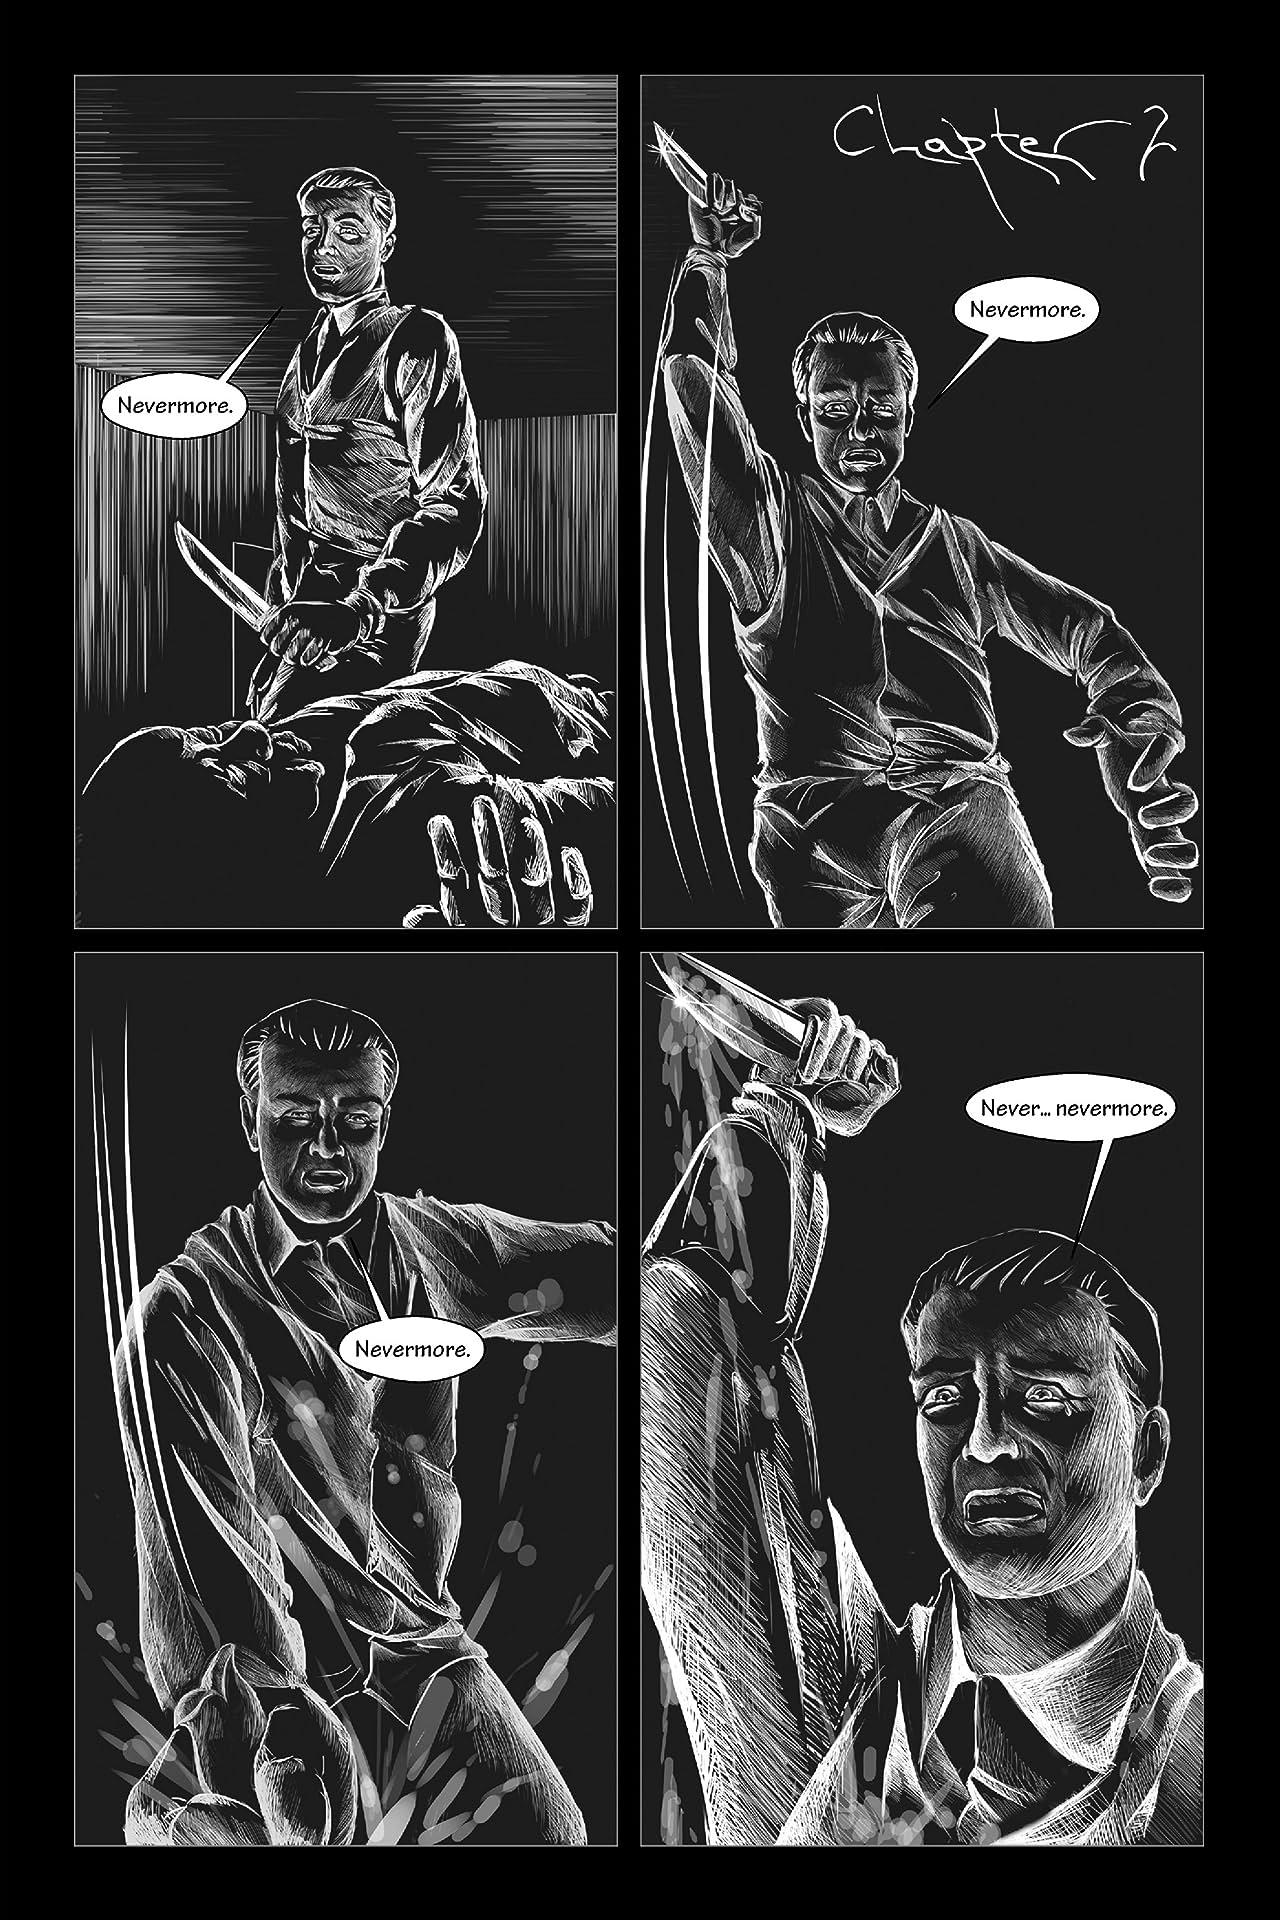 The Poe Murders #2